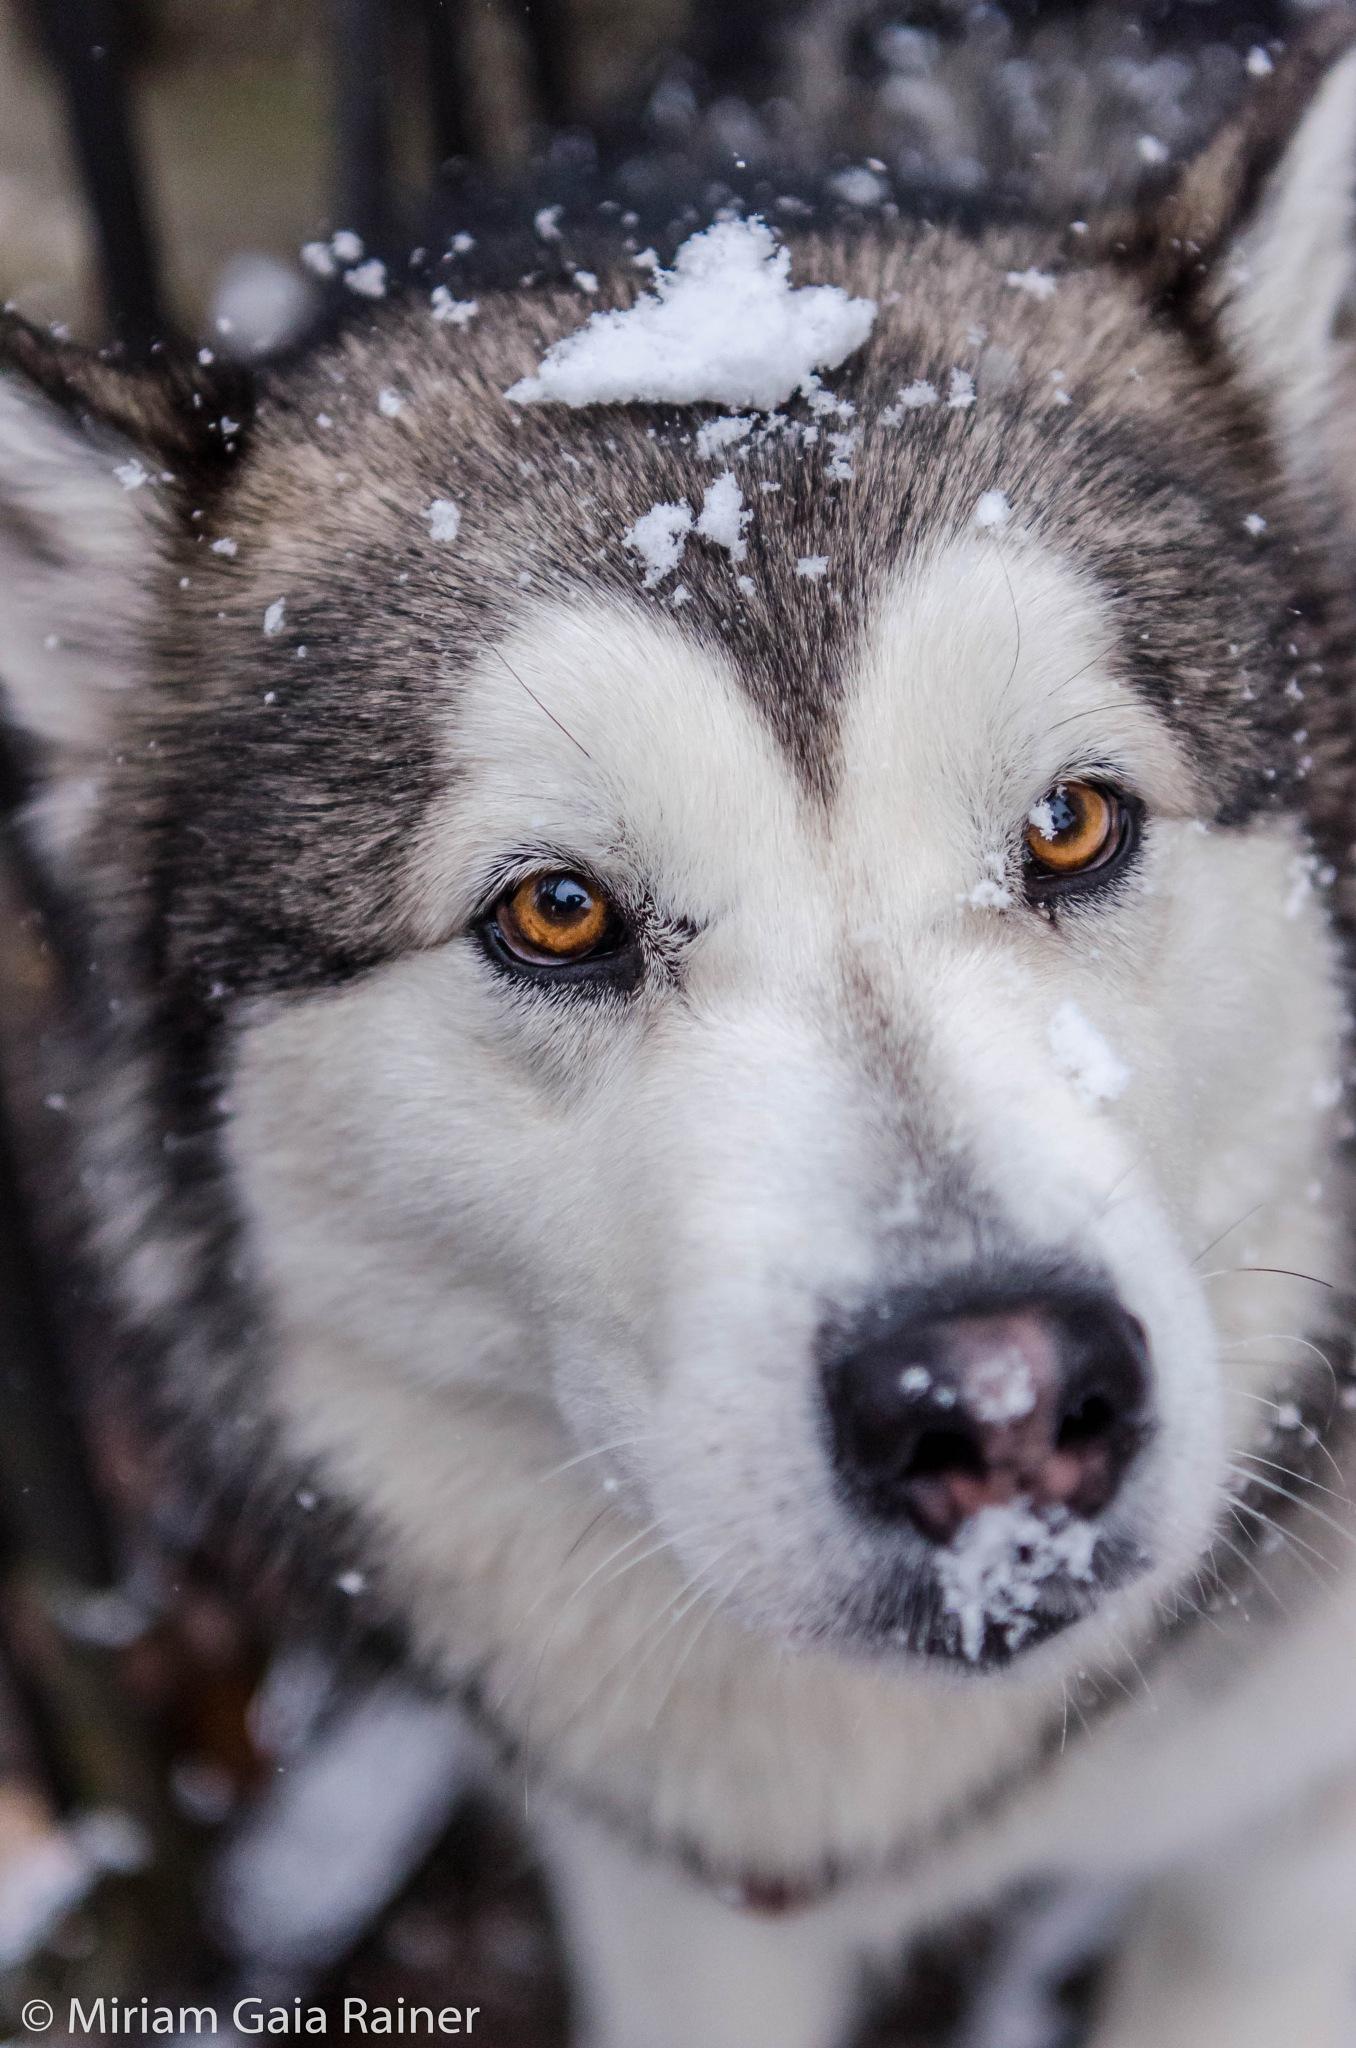 More Snow, Please by Miriam Gaia Rainer